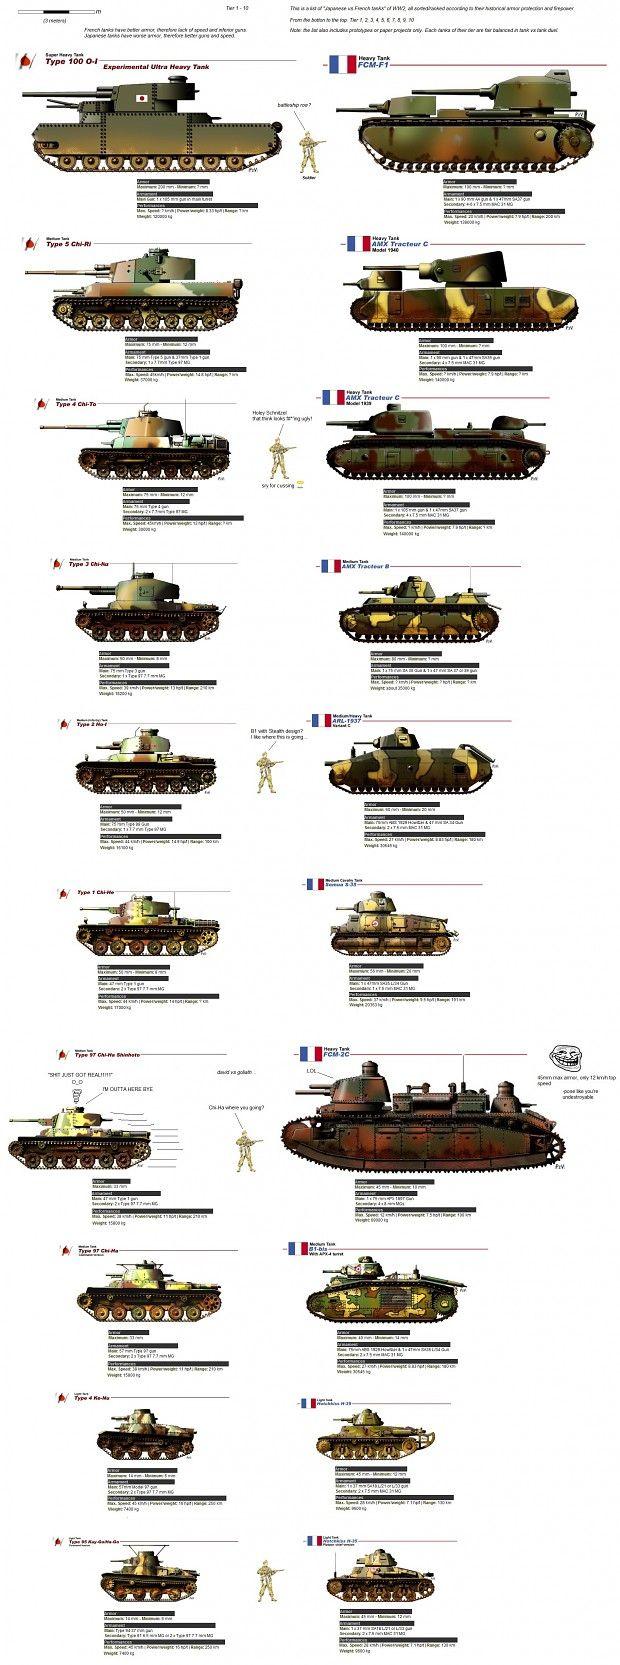 tank tier ranking list